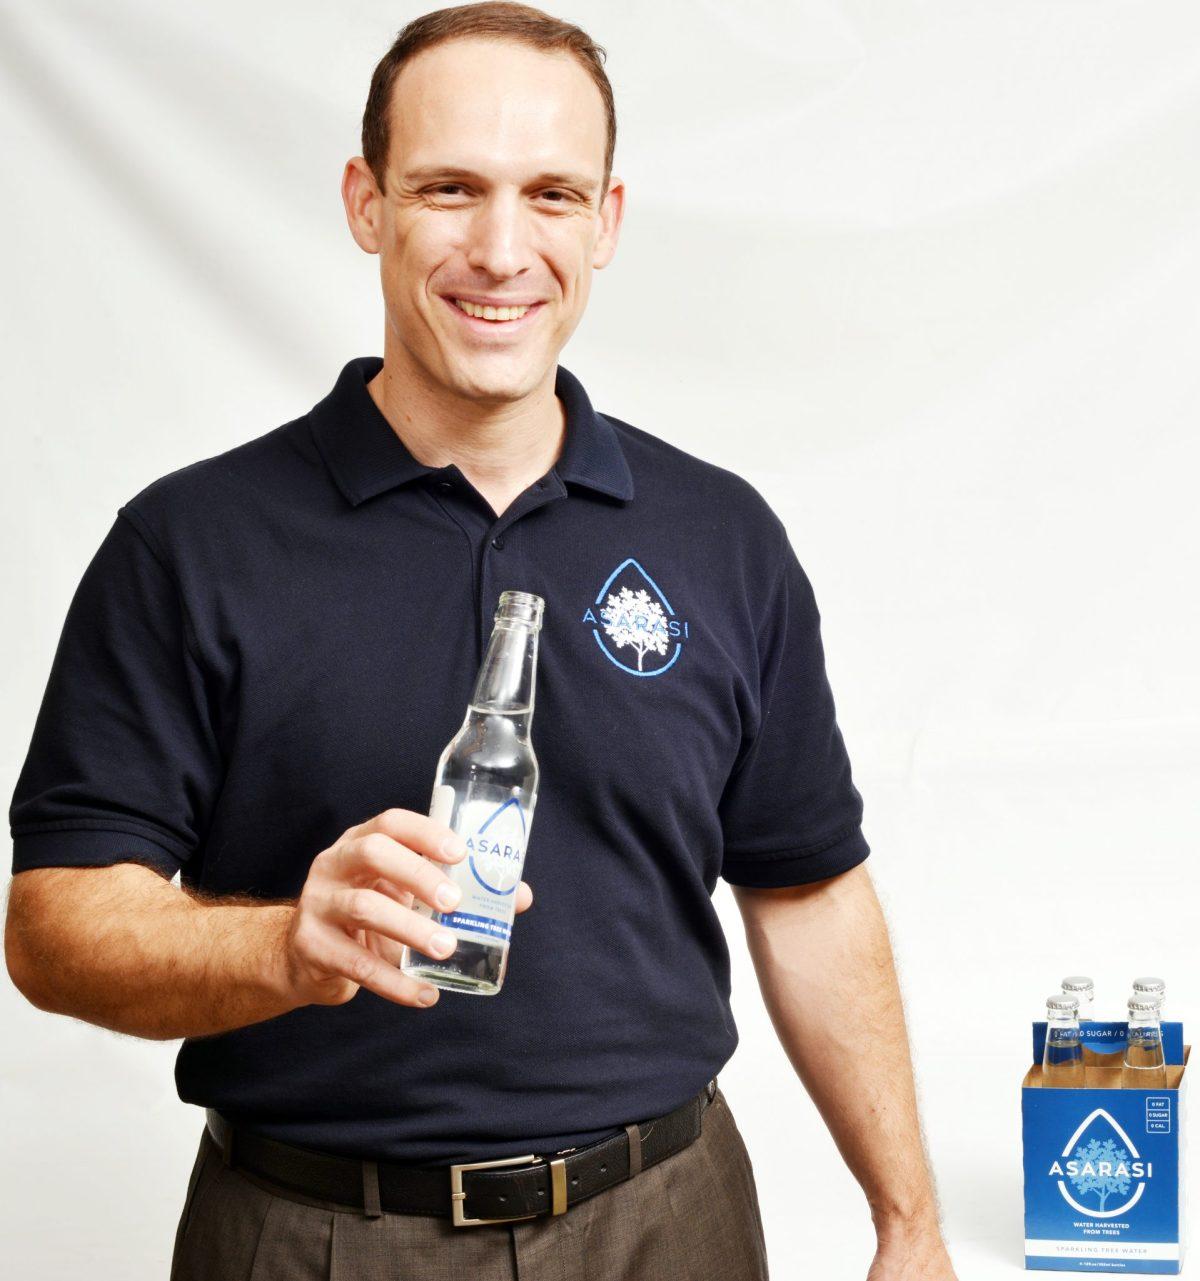 Adam Lazar, Asarasi Sparkling Tree Water